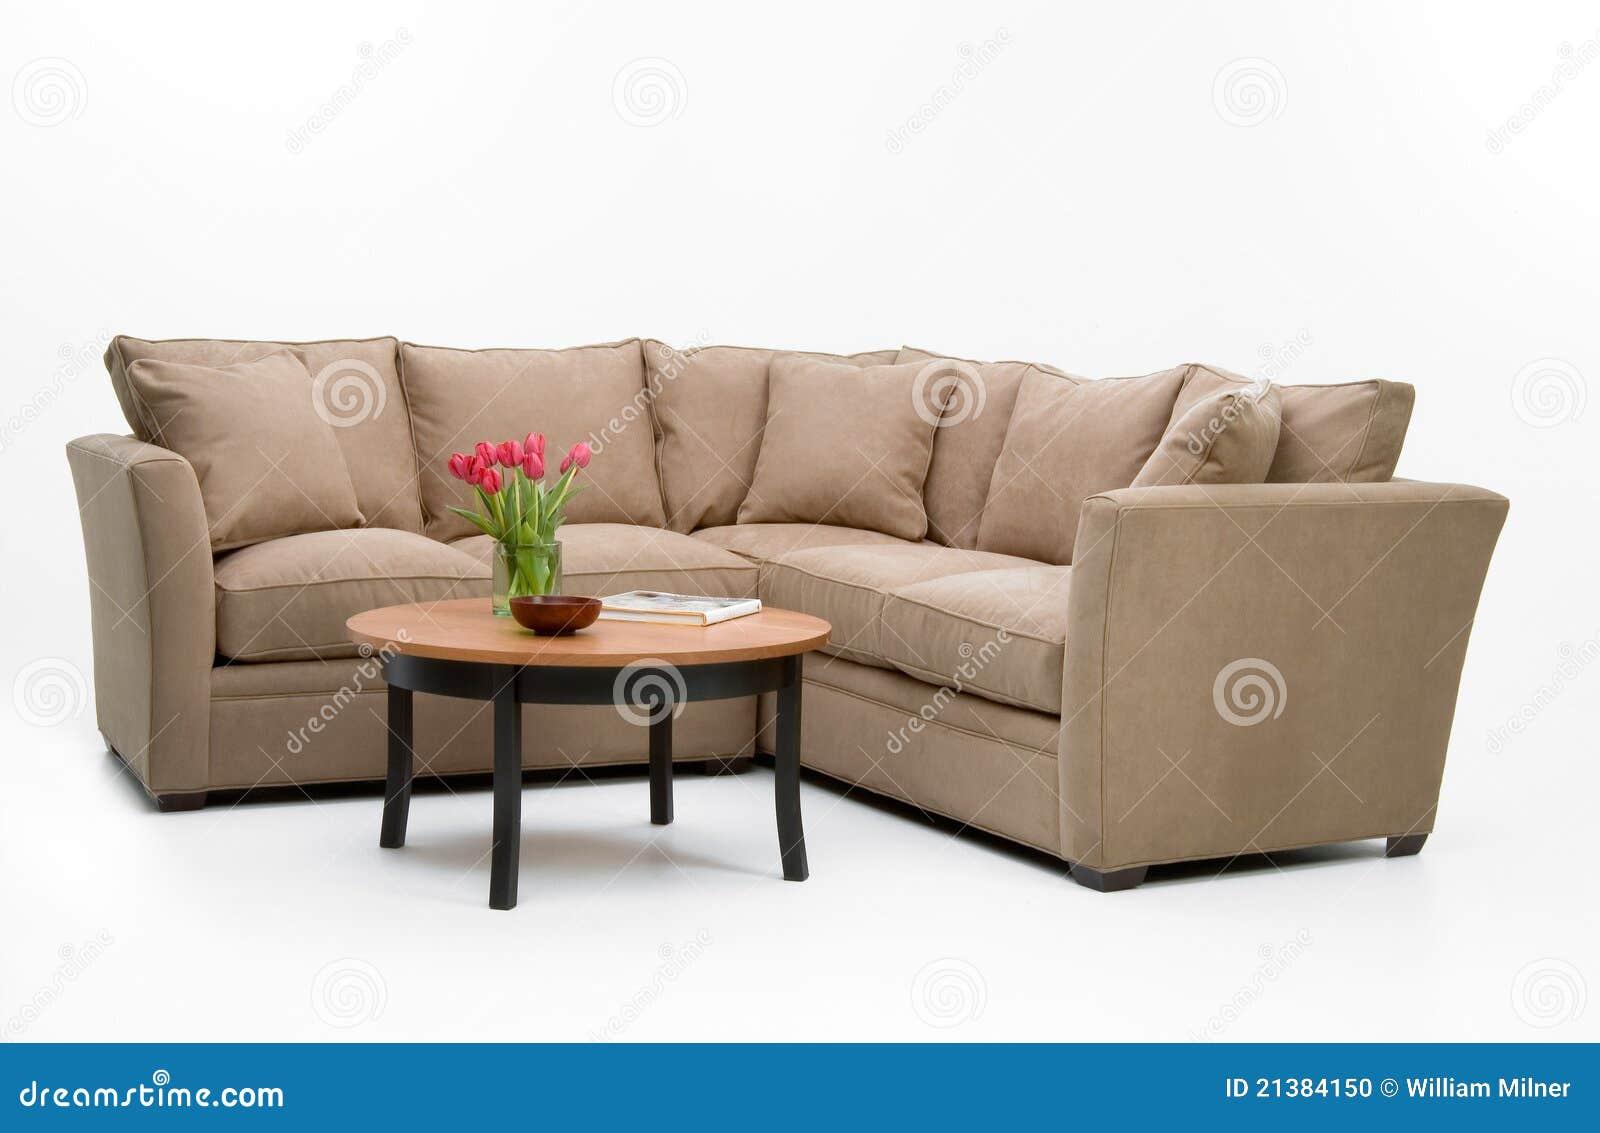 Fabric Sofa Set Table Stock Photo Image 21384150